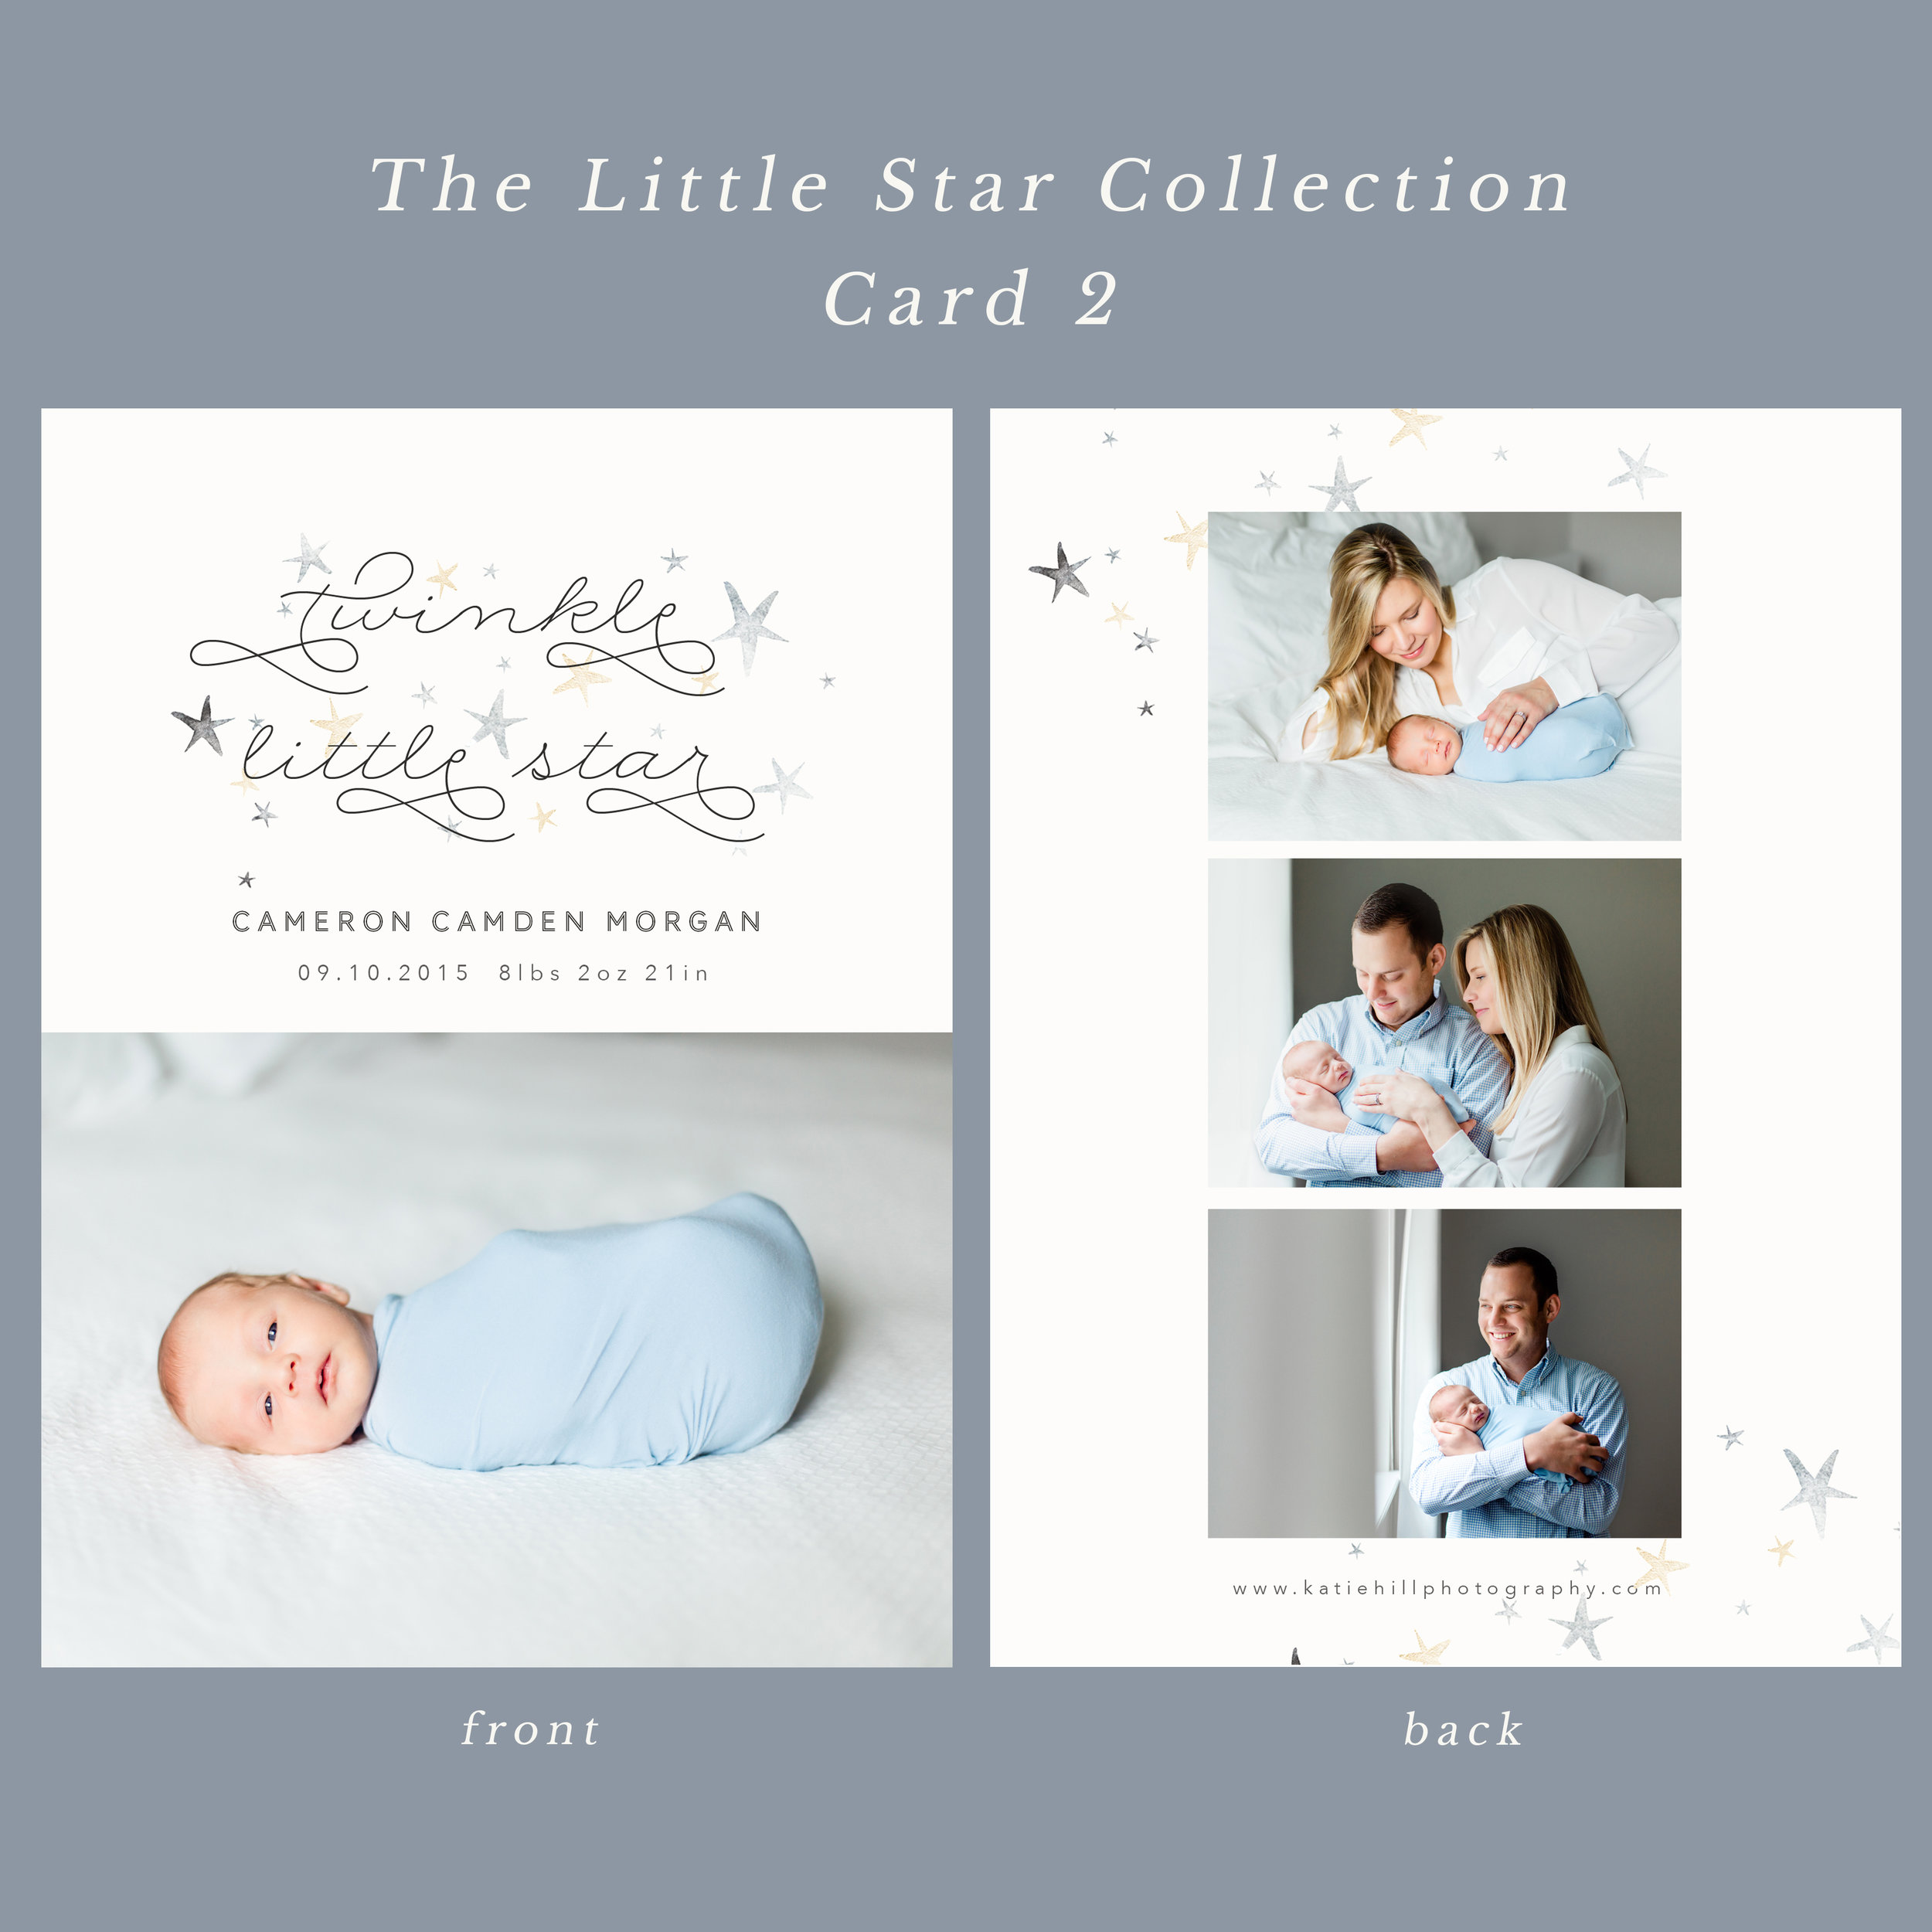 LittleStar_Card2.jpg